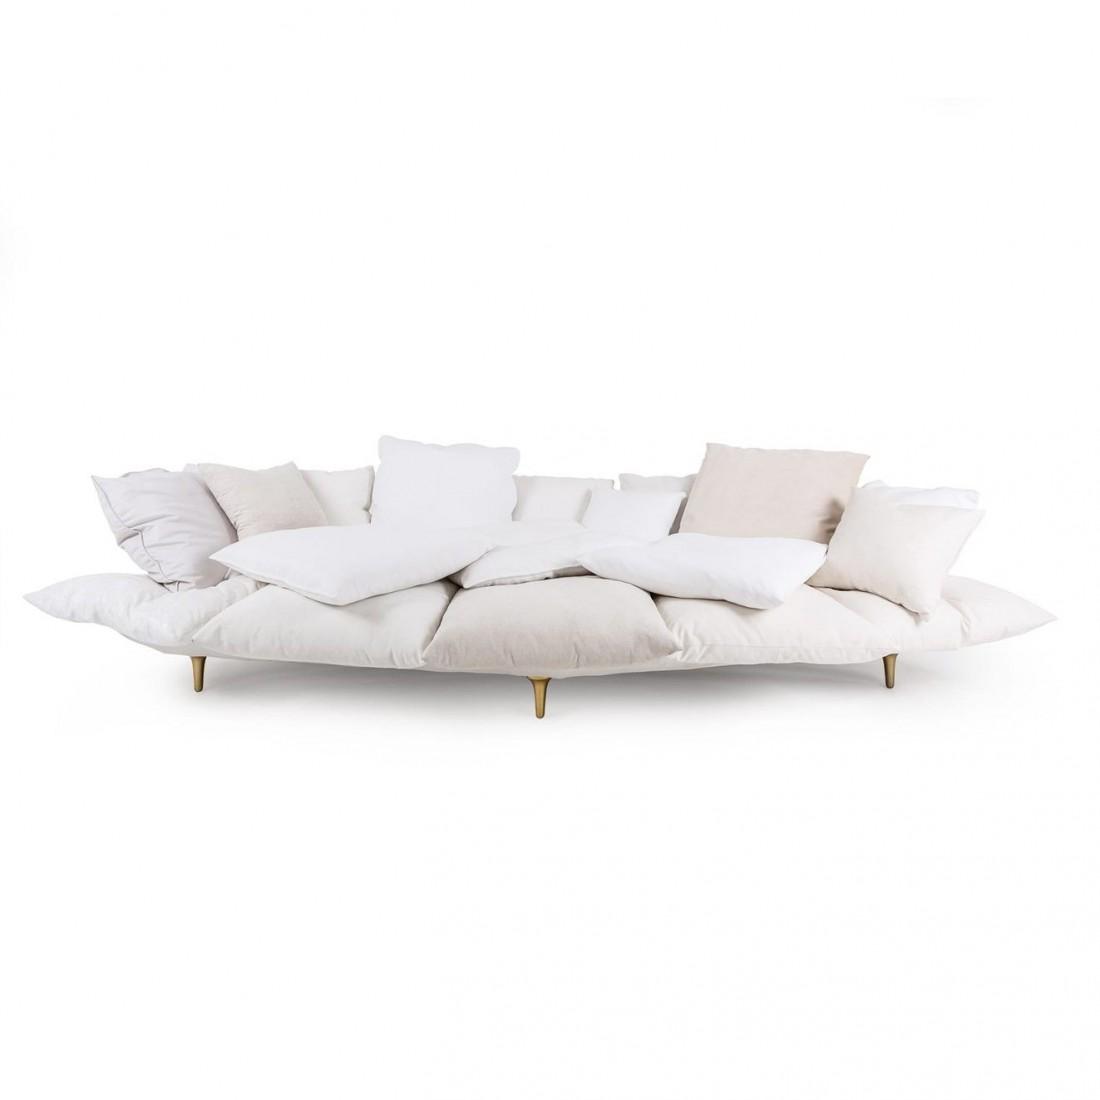 Canapé Comfy Seletti